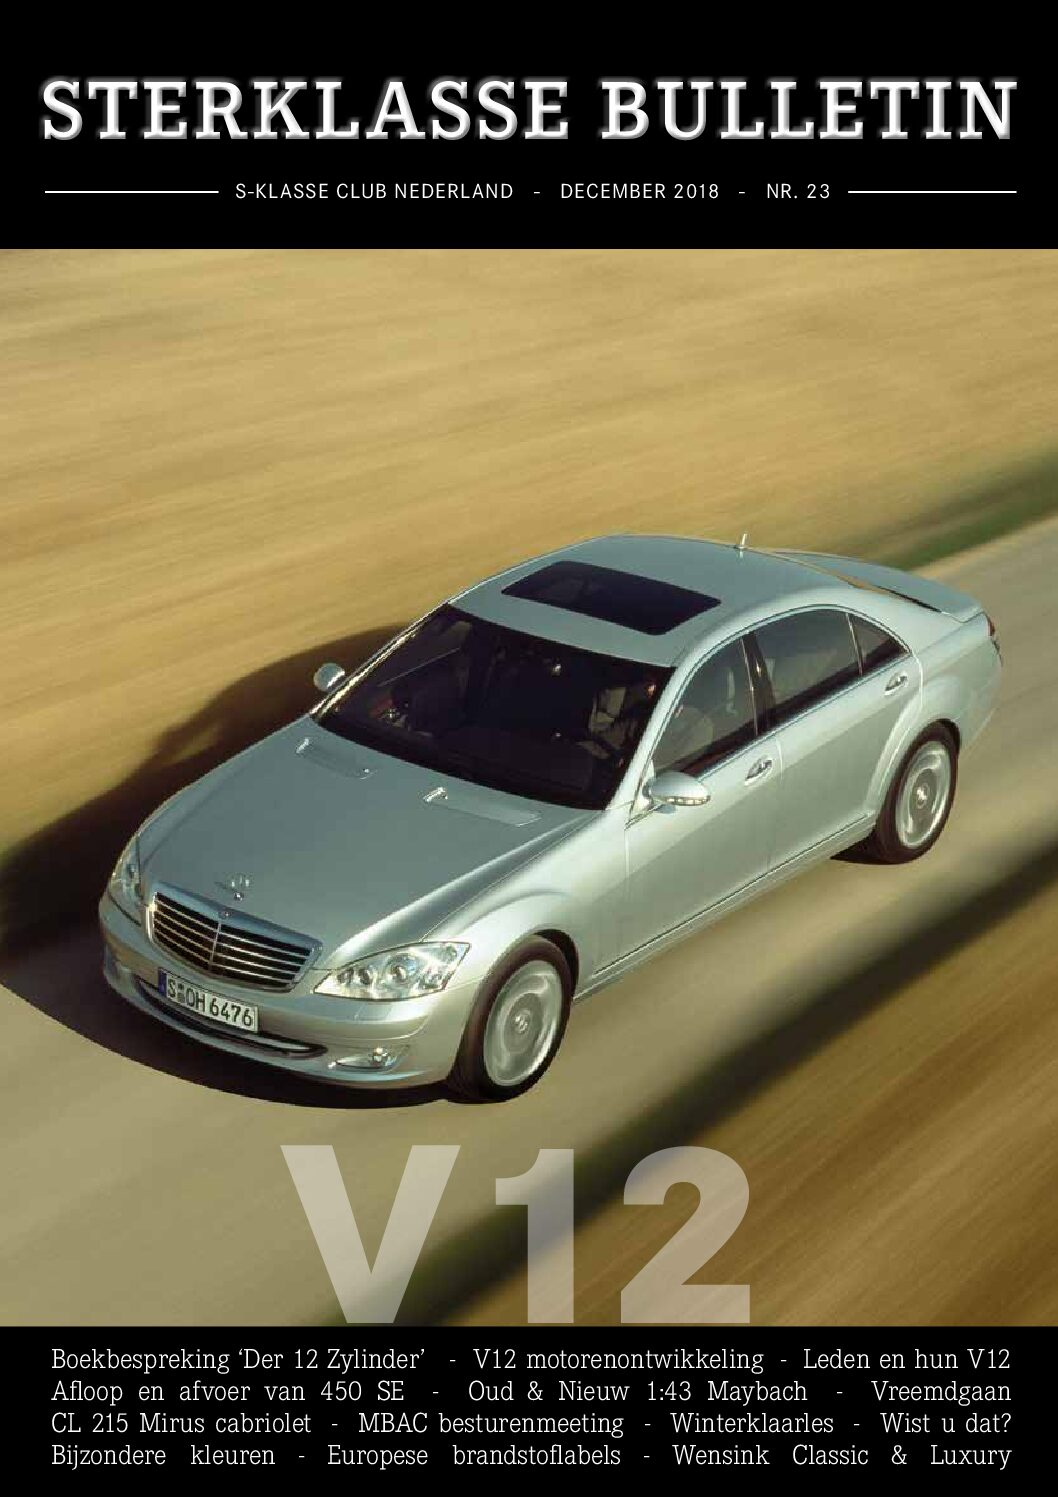 Sterklasse Bulletin 16 SKCN Mercedes-Benz-S-Klasse Club Nederland